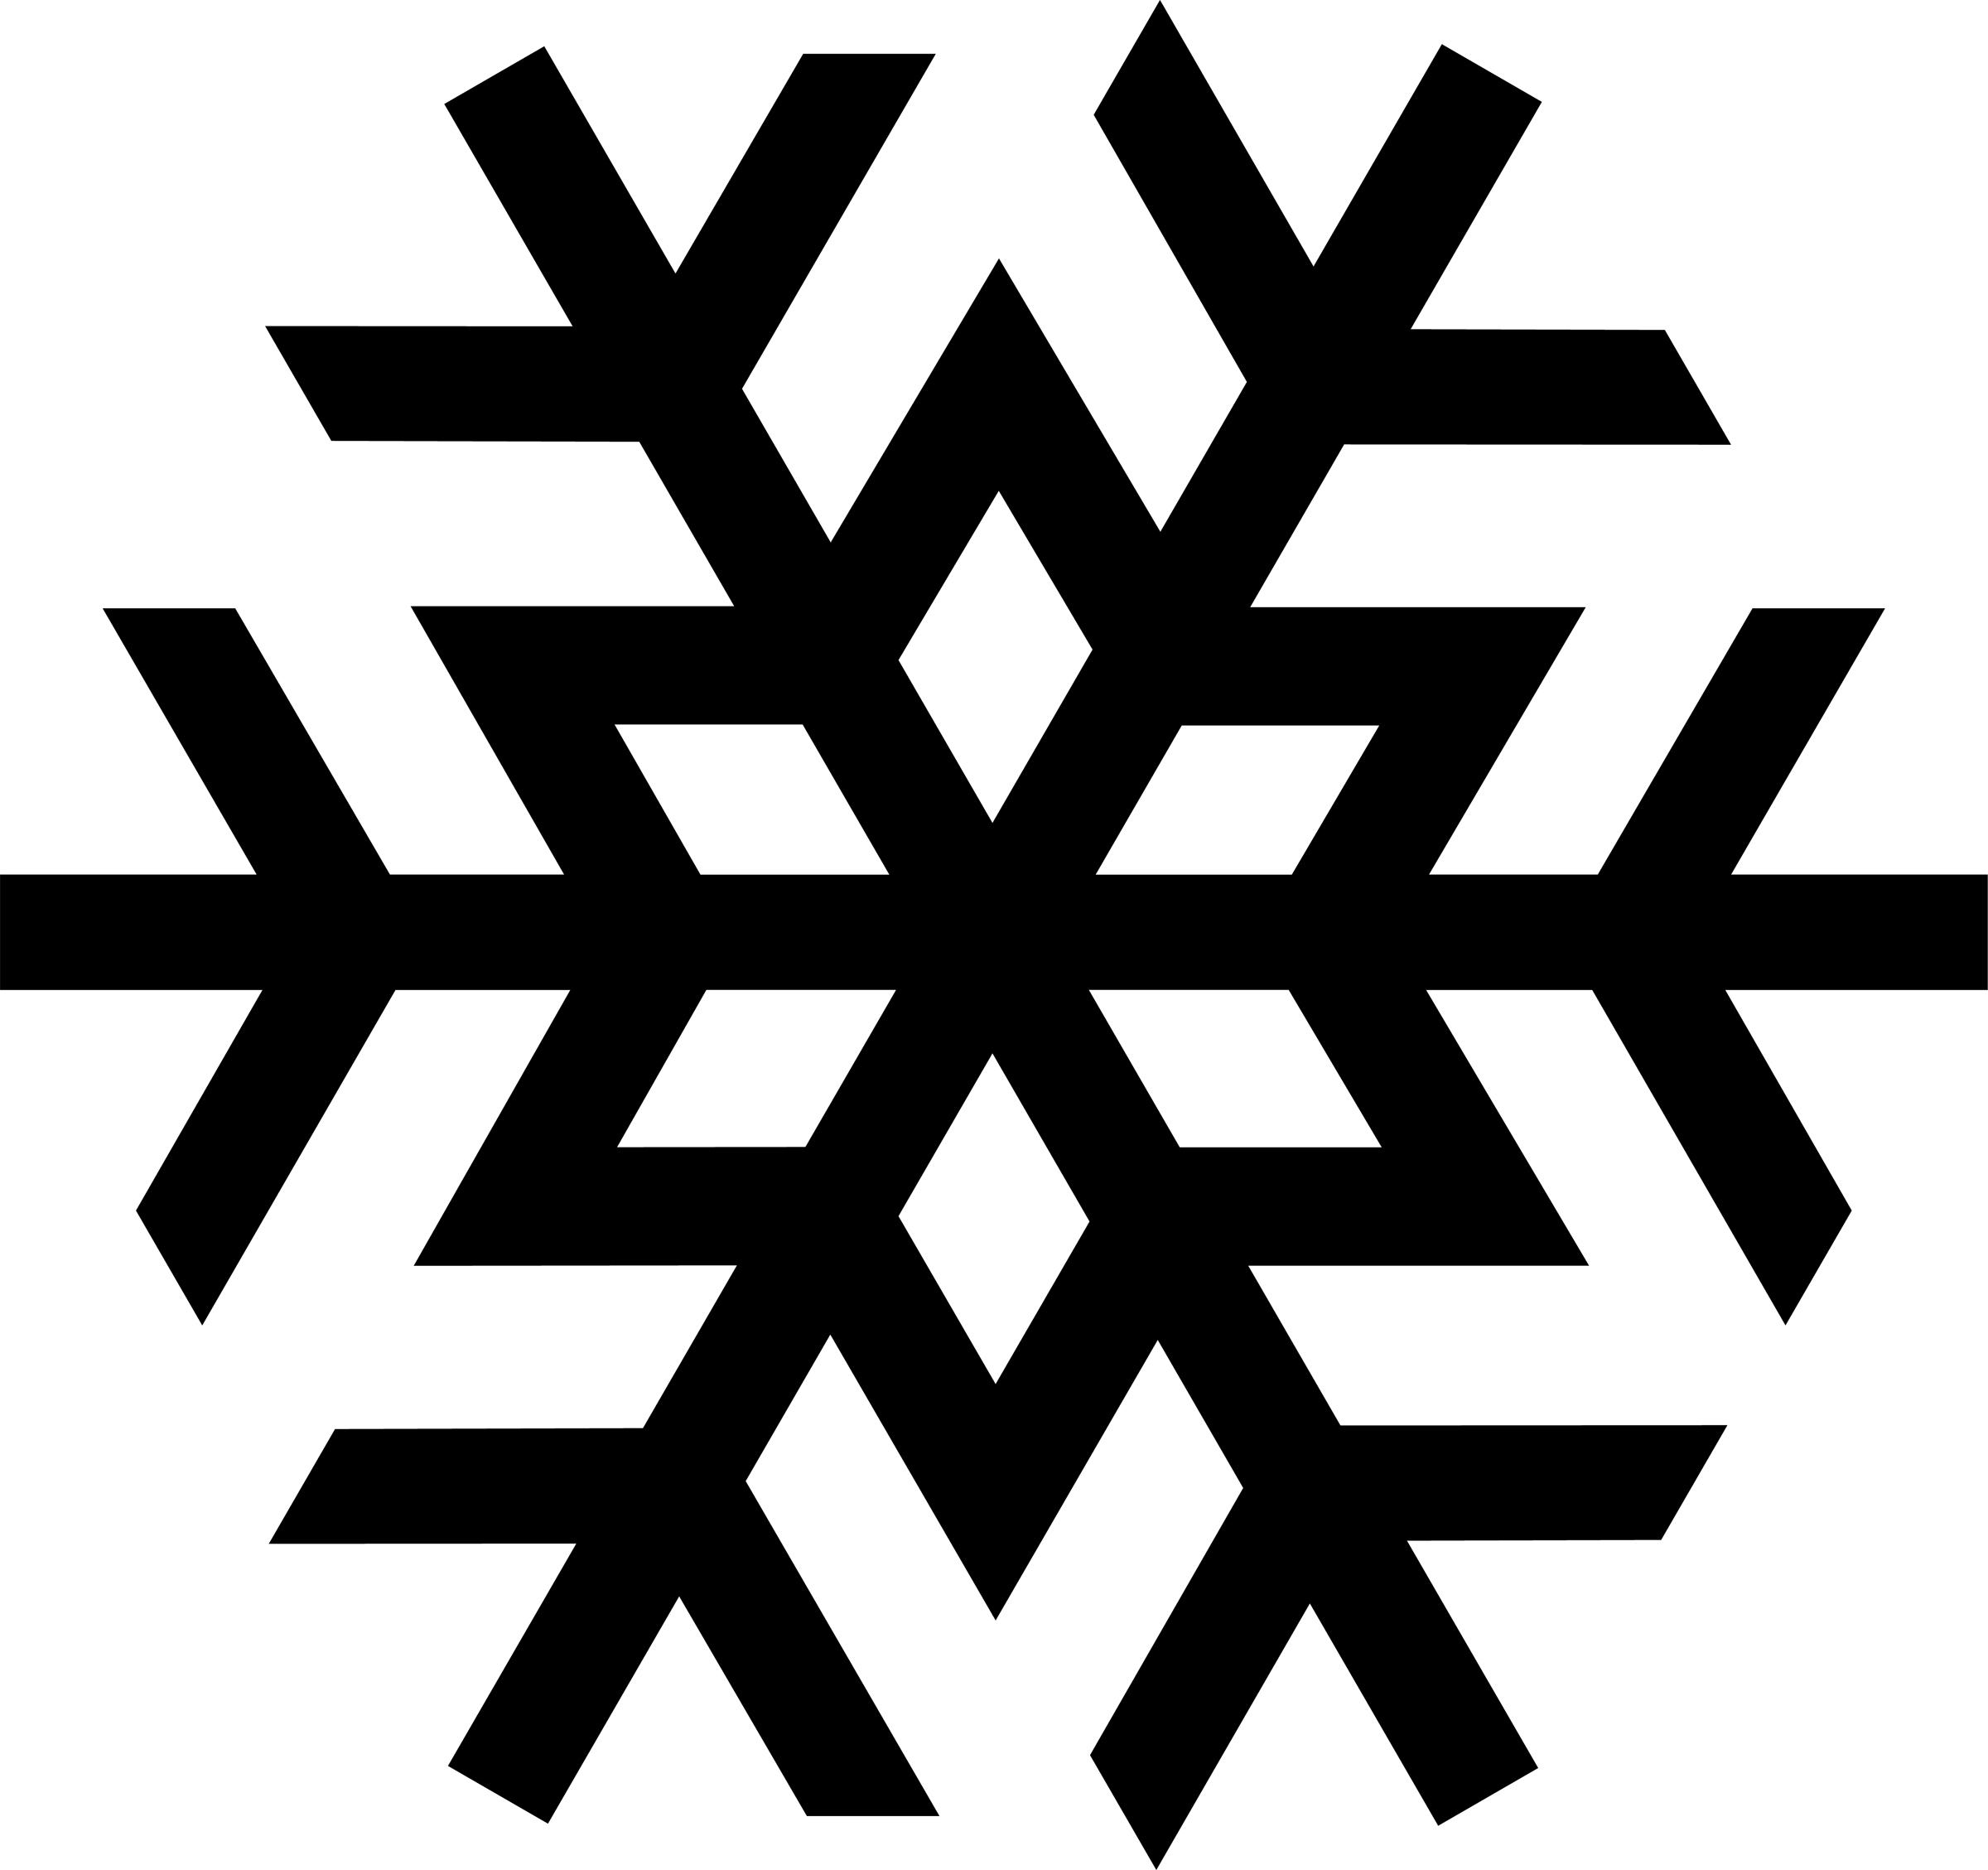 Snowflake Clip Art Image - Snowflake Clip Art